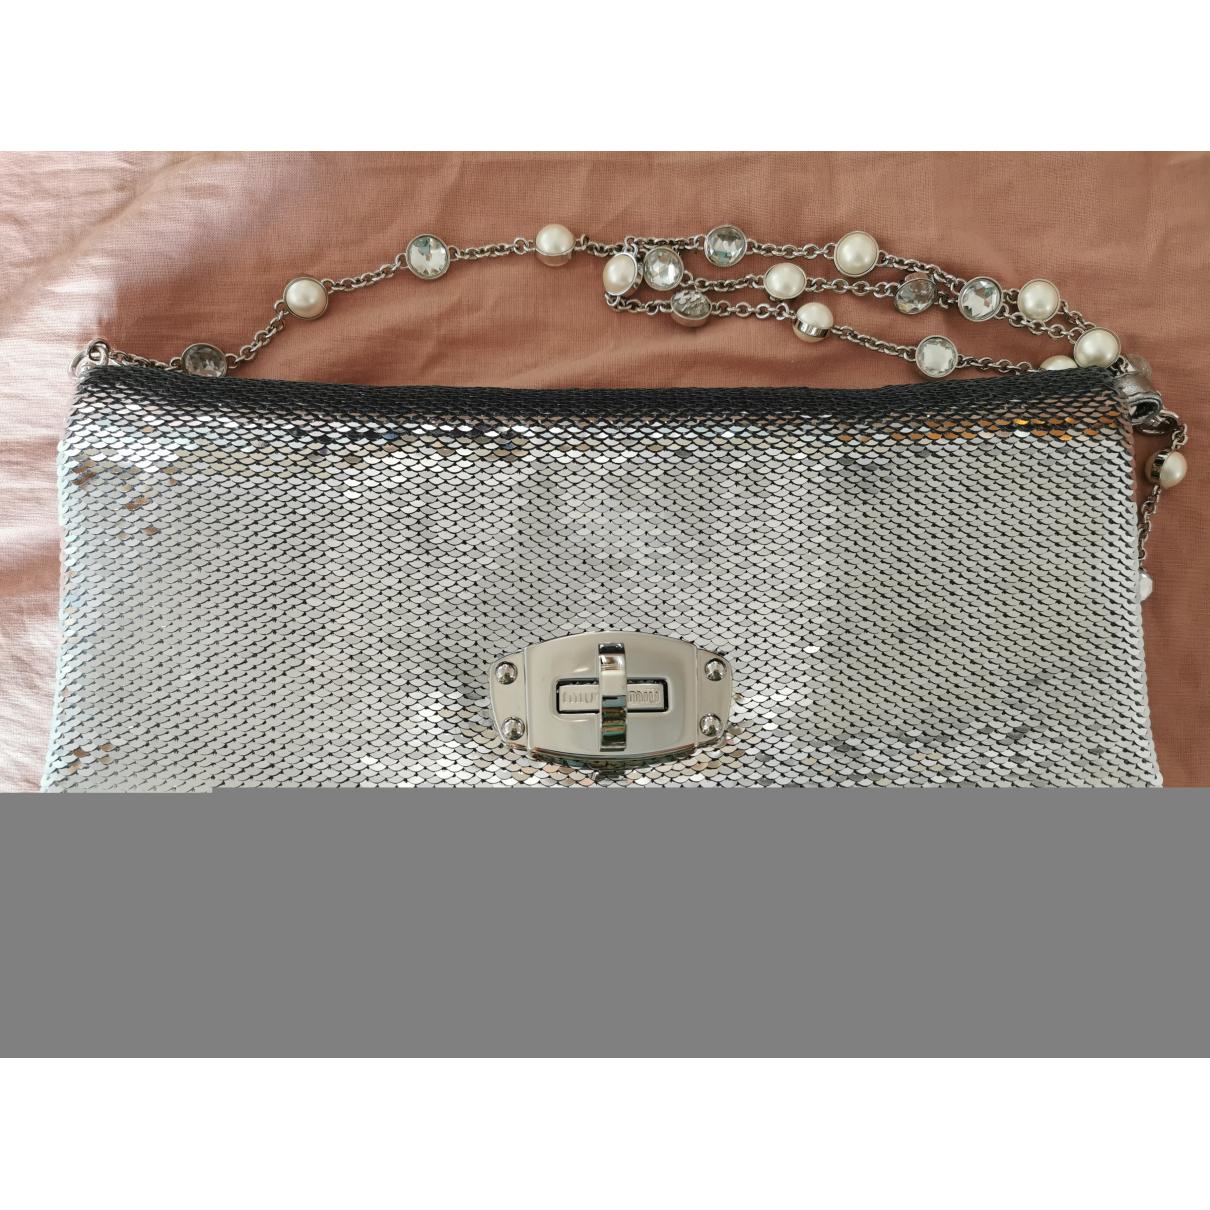 Miu Miu Miu Crystal Handtasche in  Silber Mit Pailletten